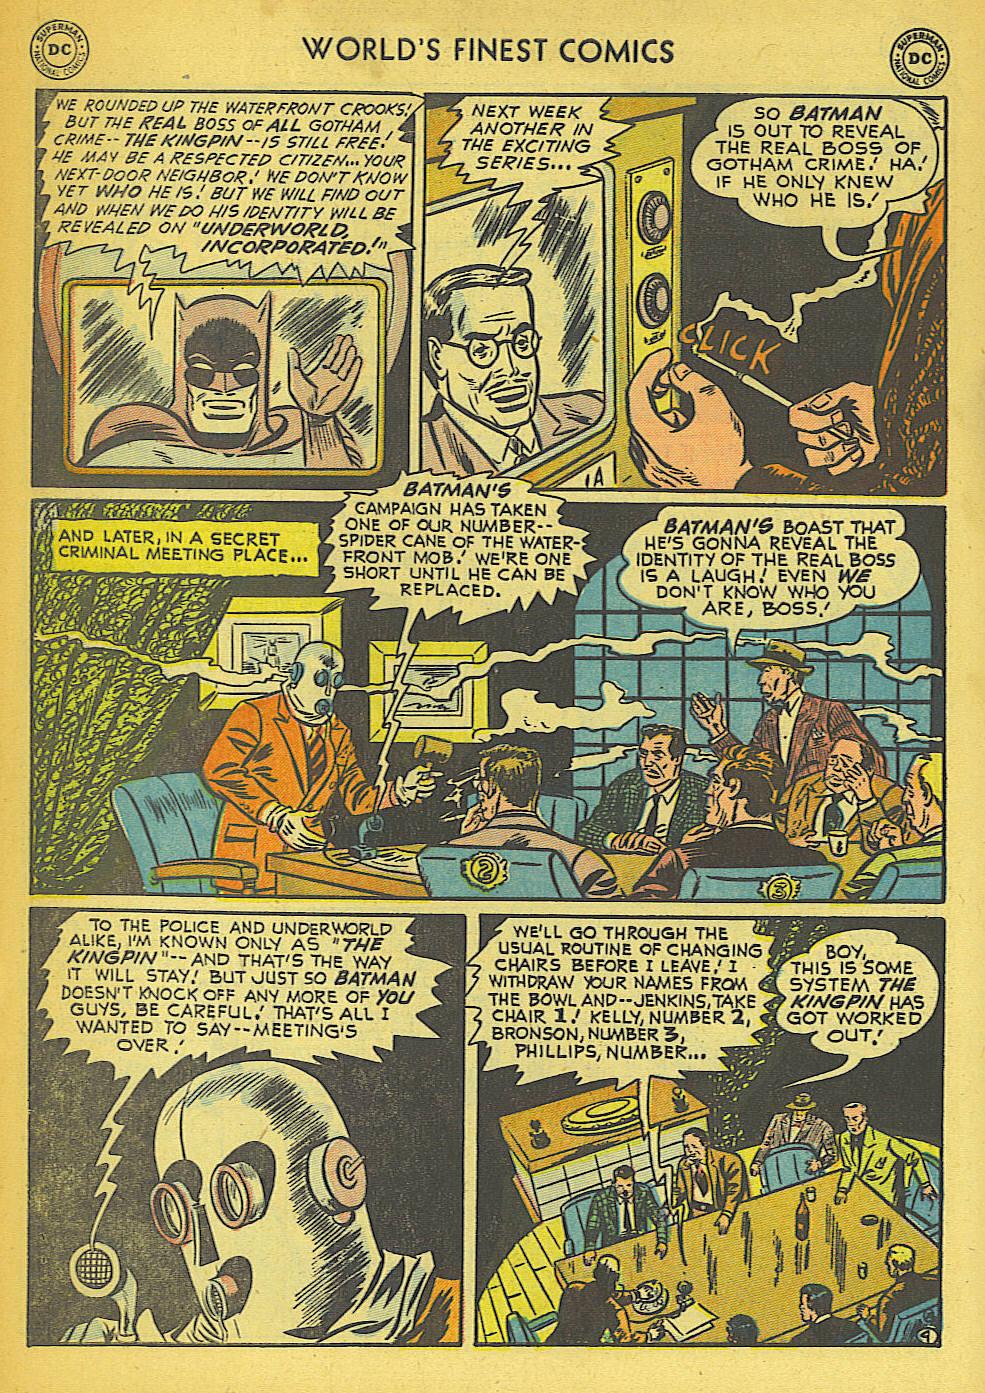 Read online World's Finest Comics comic -  Issue #57 - 56